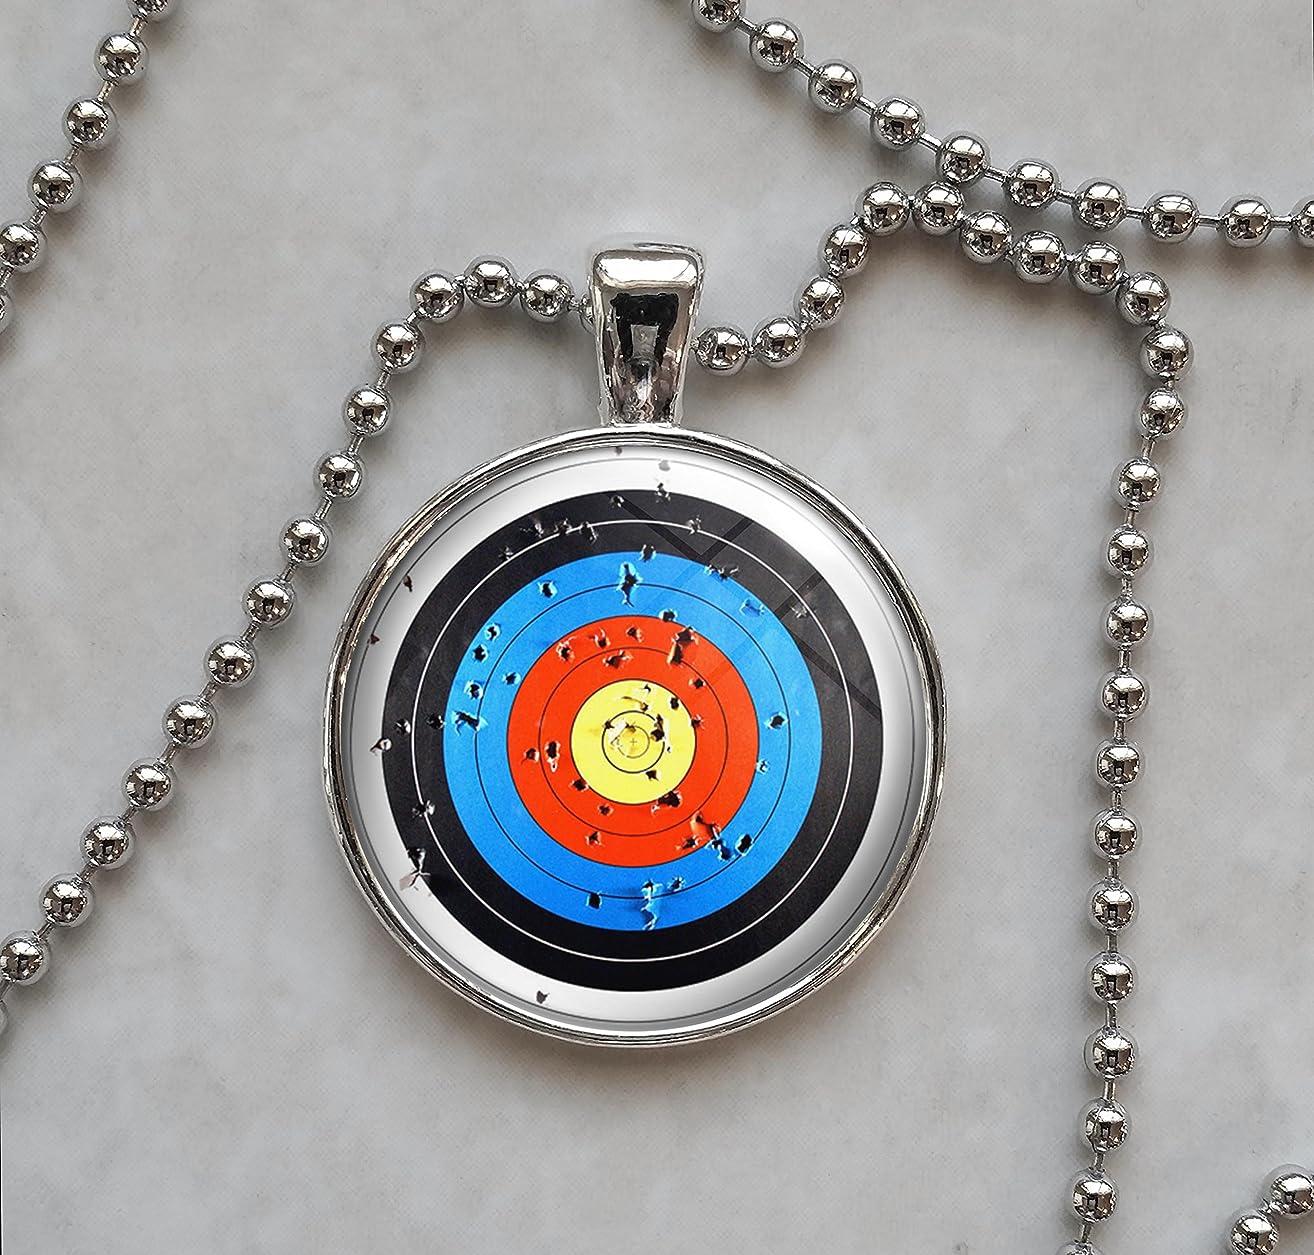 Archery Bow Arrow Target Pendant Necklace